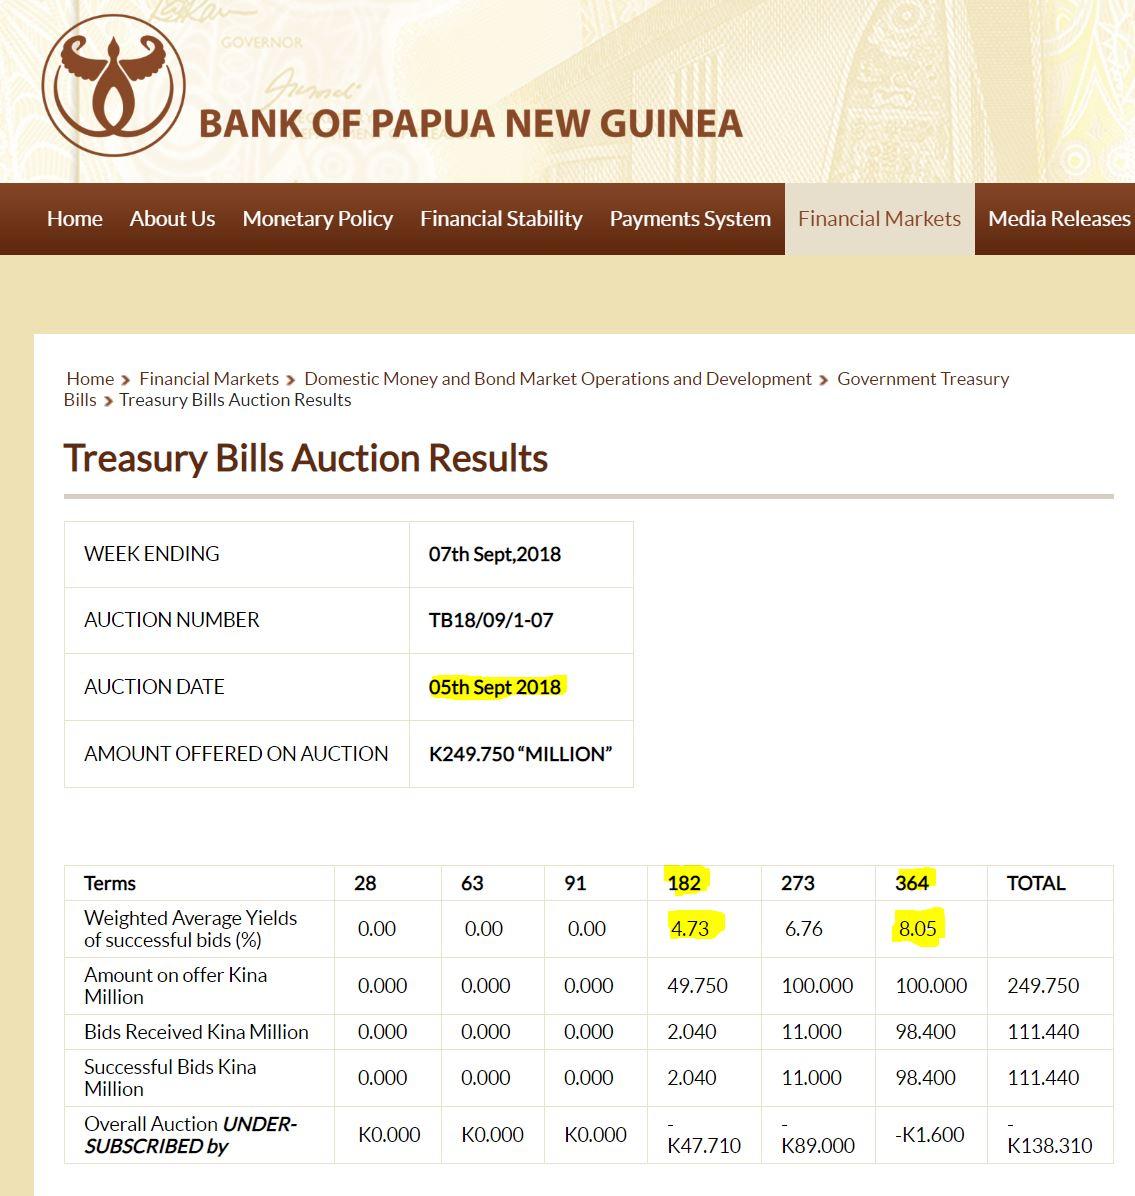 BPNG Treasury Bills 5 Sept 18.